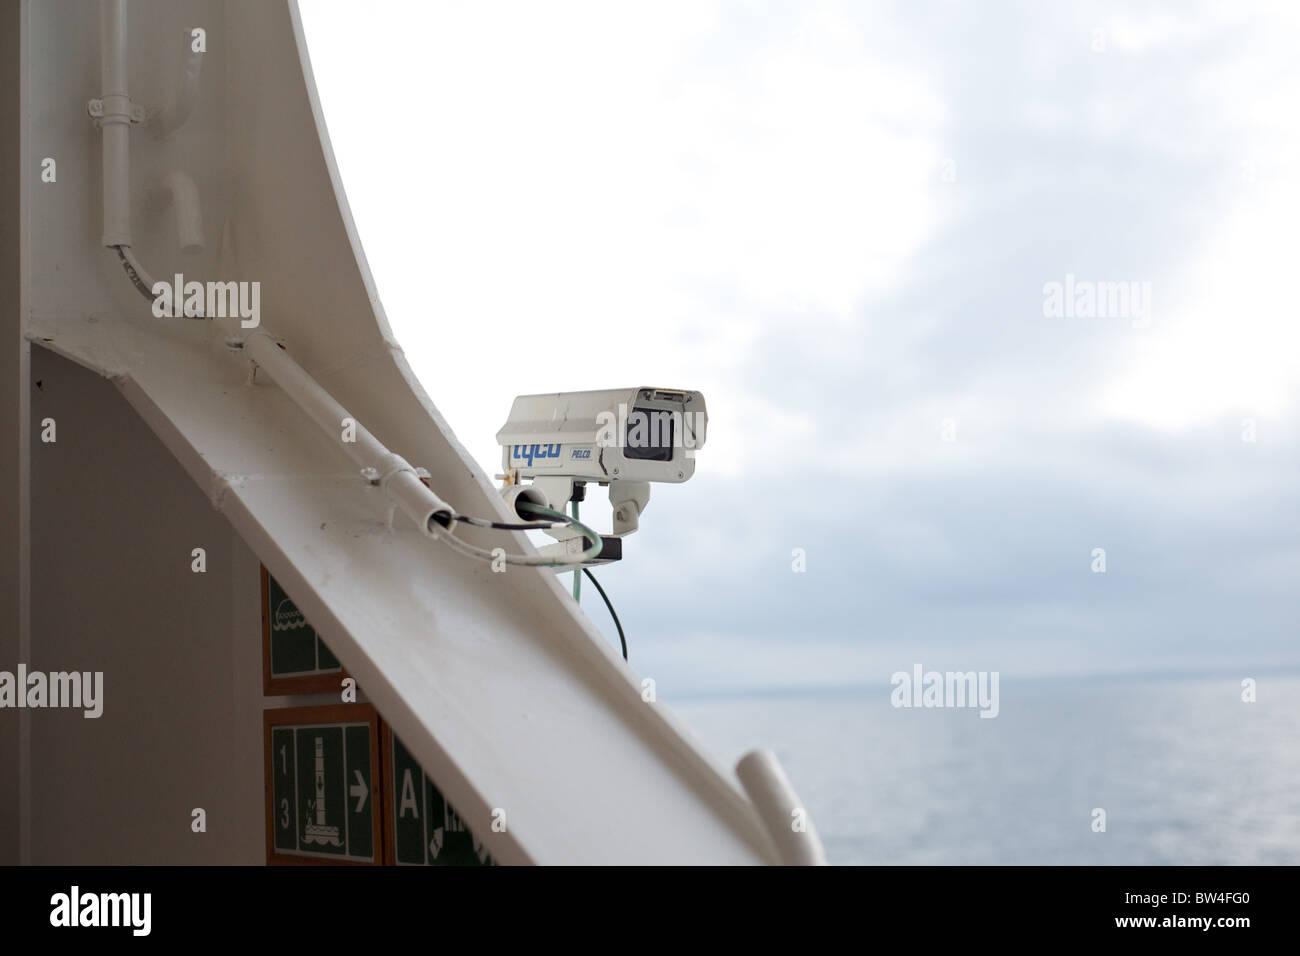 A Cctv Camera On The Promenade Deck Of POs Cruise Ship The - Cruise ship cam